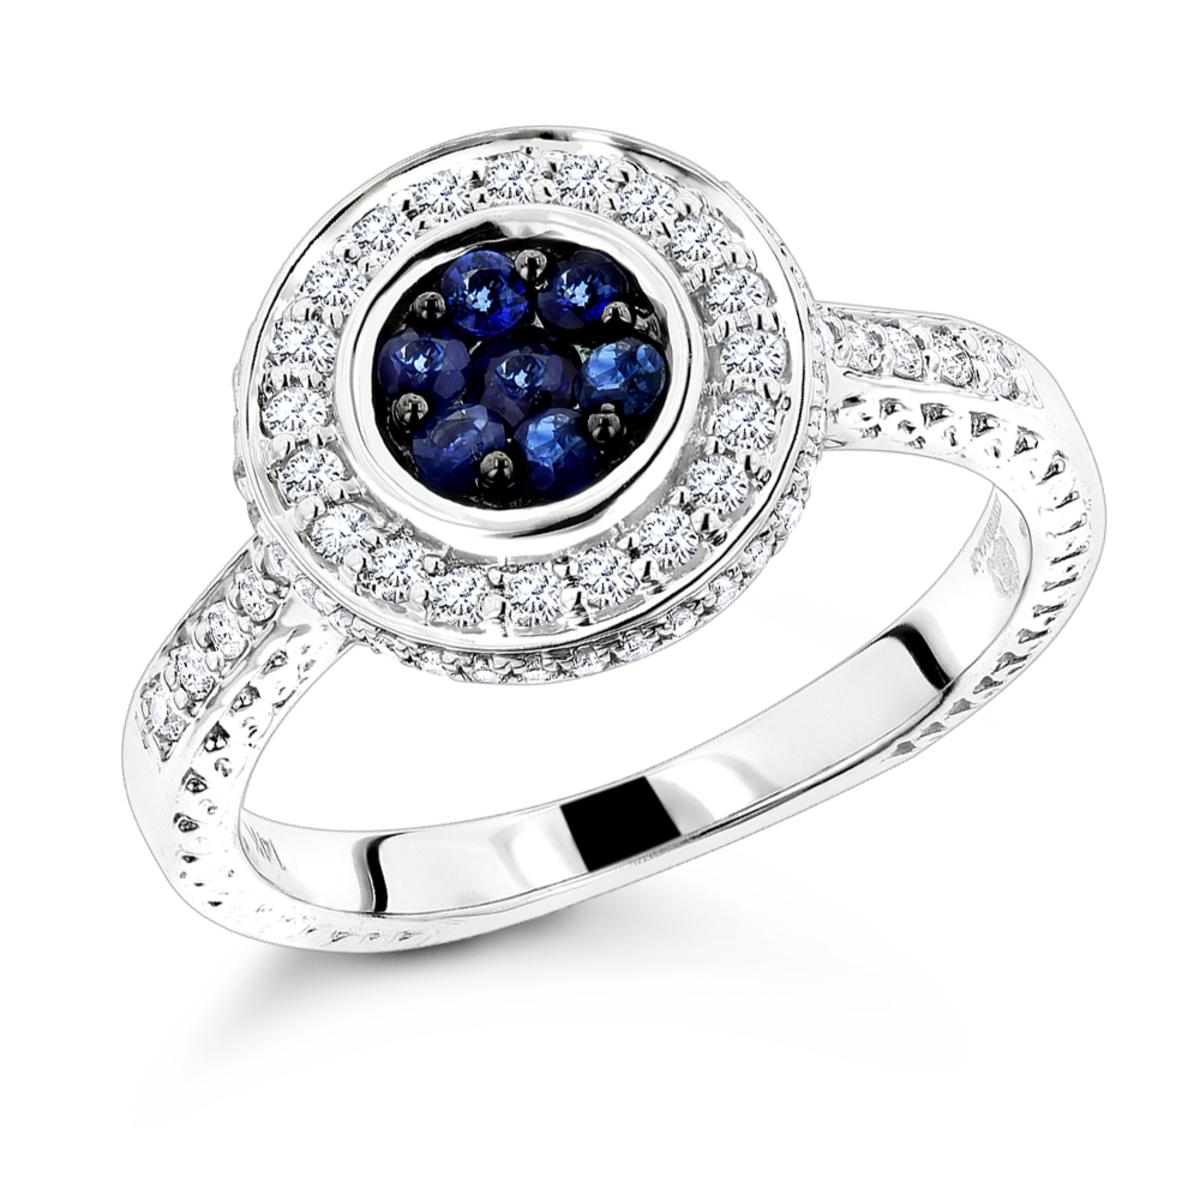 Unique Ladies Diamond Rings: 14K Gold Blue Sapphire Engagement Ring 0.7ctw